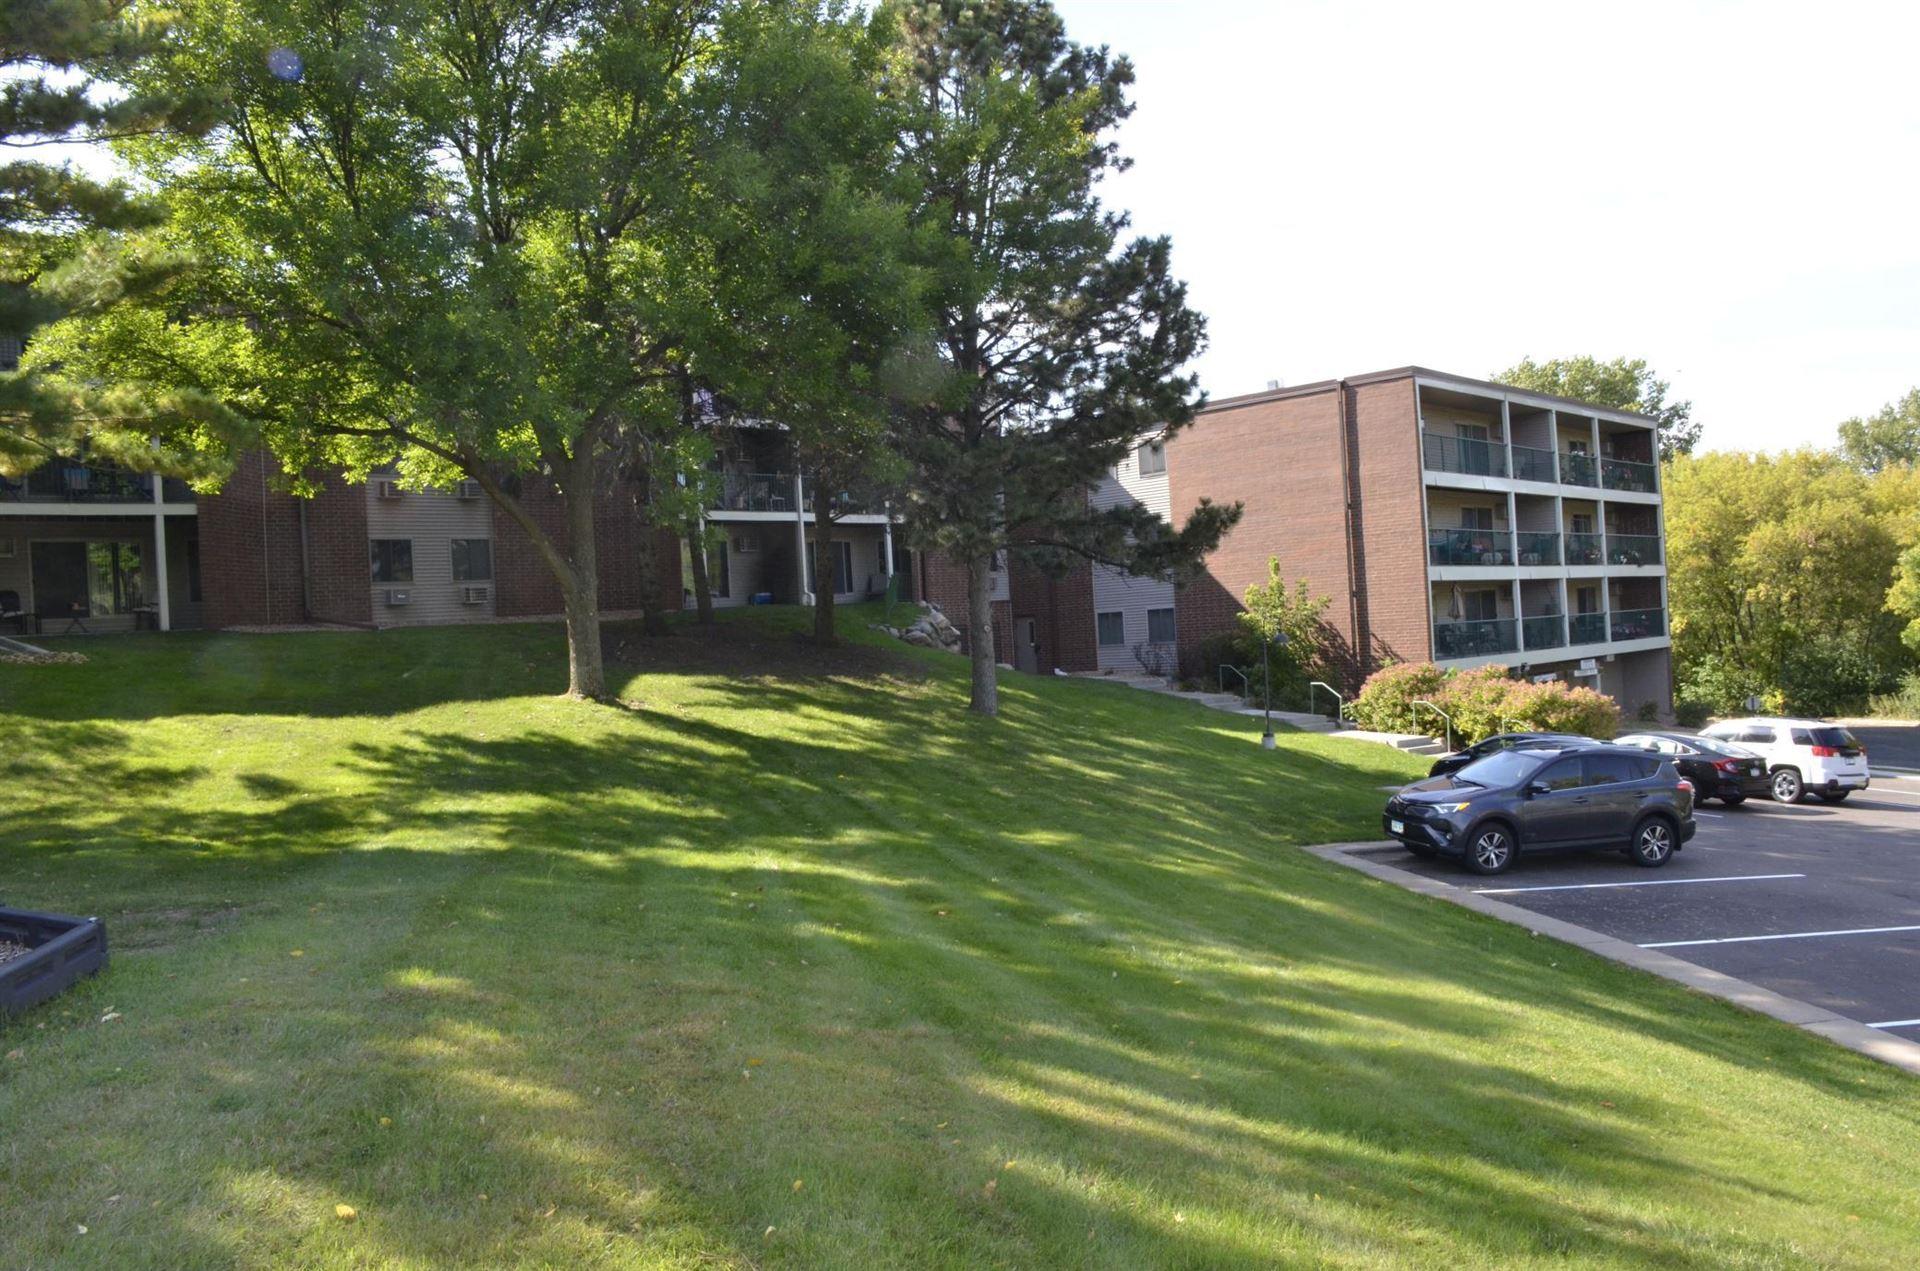 Photo of 1700 Four Oaks Road #121, Eagan, MN 55121 (MLS # 6102544)